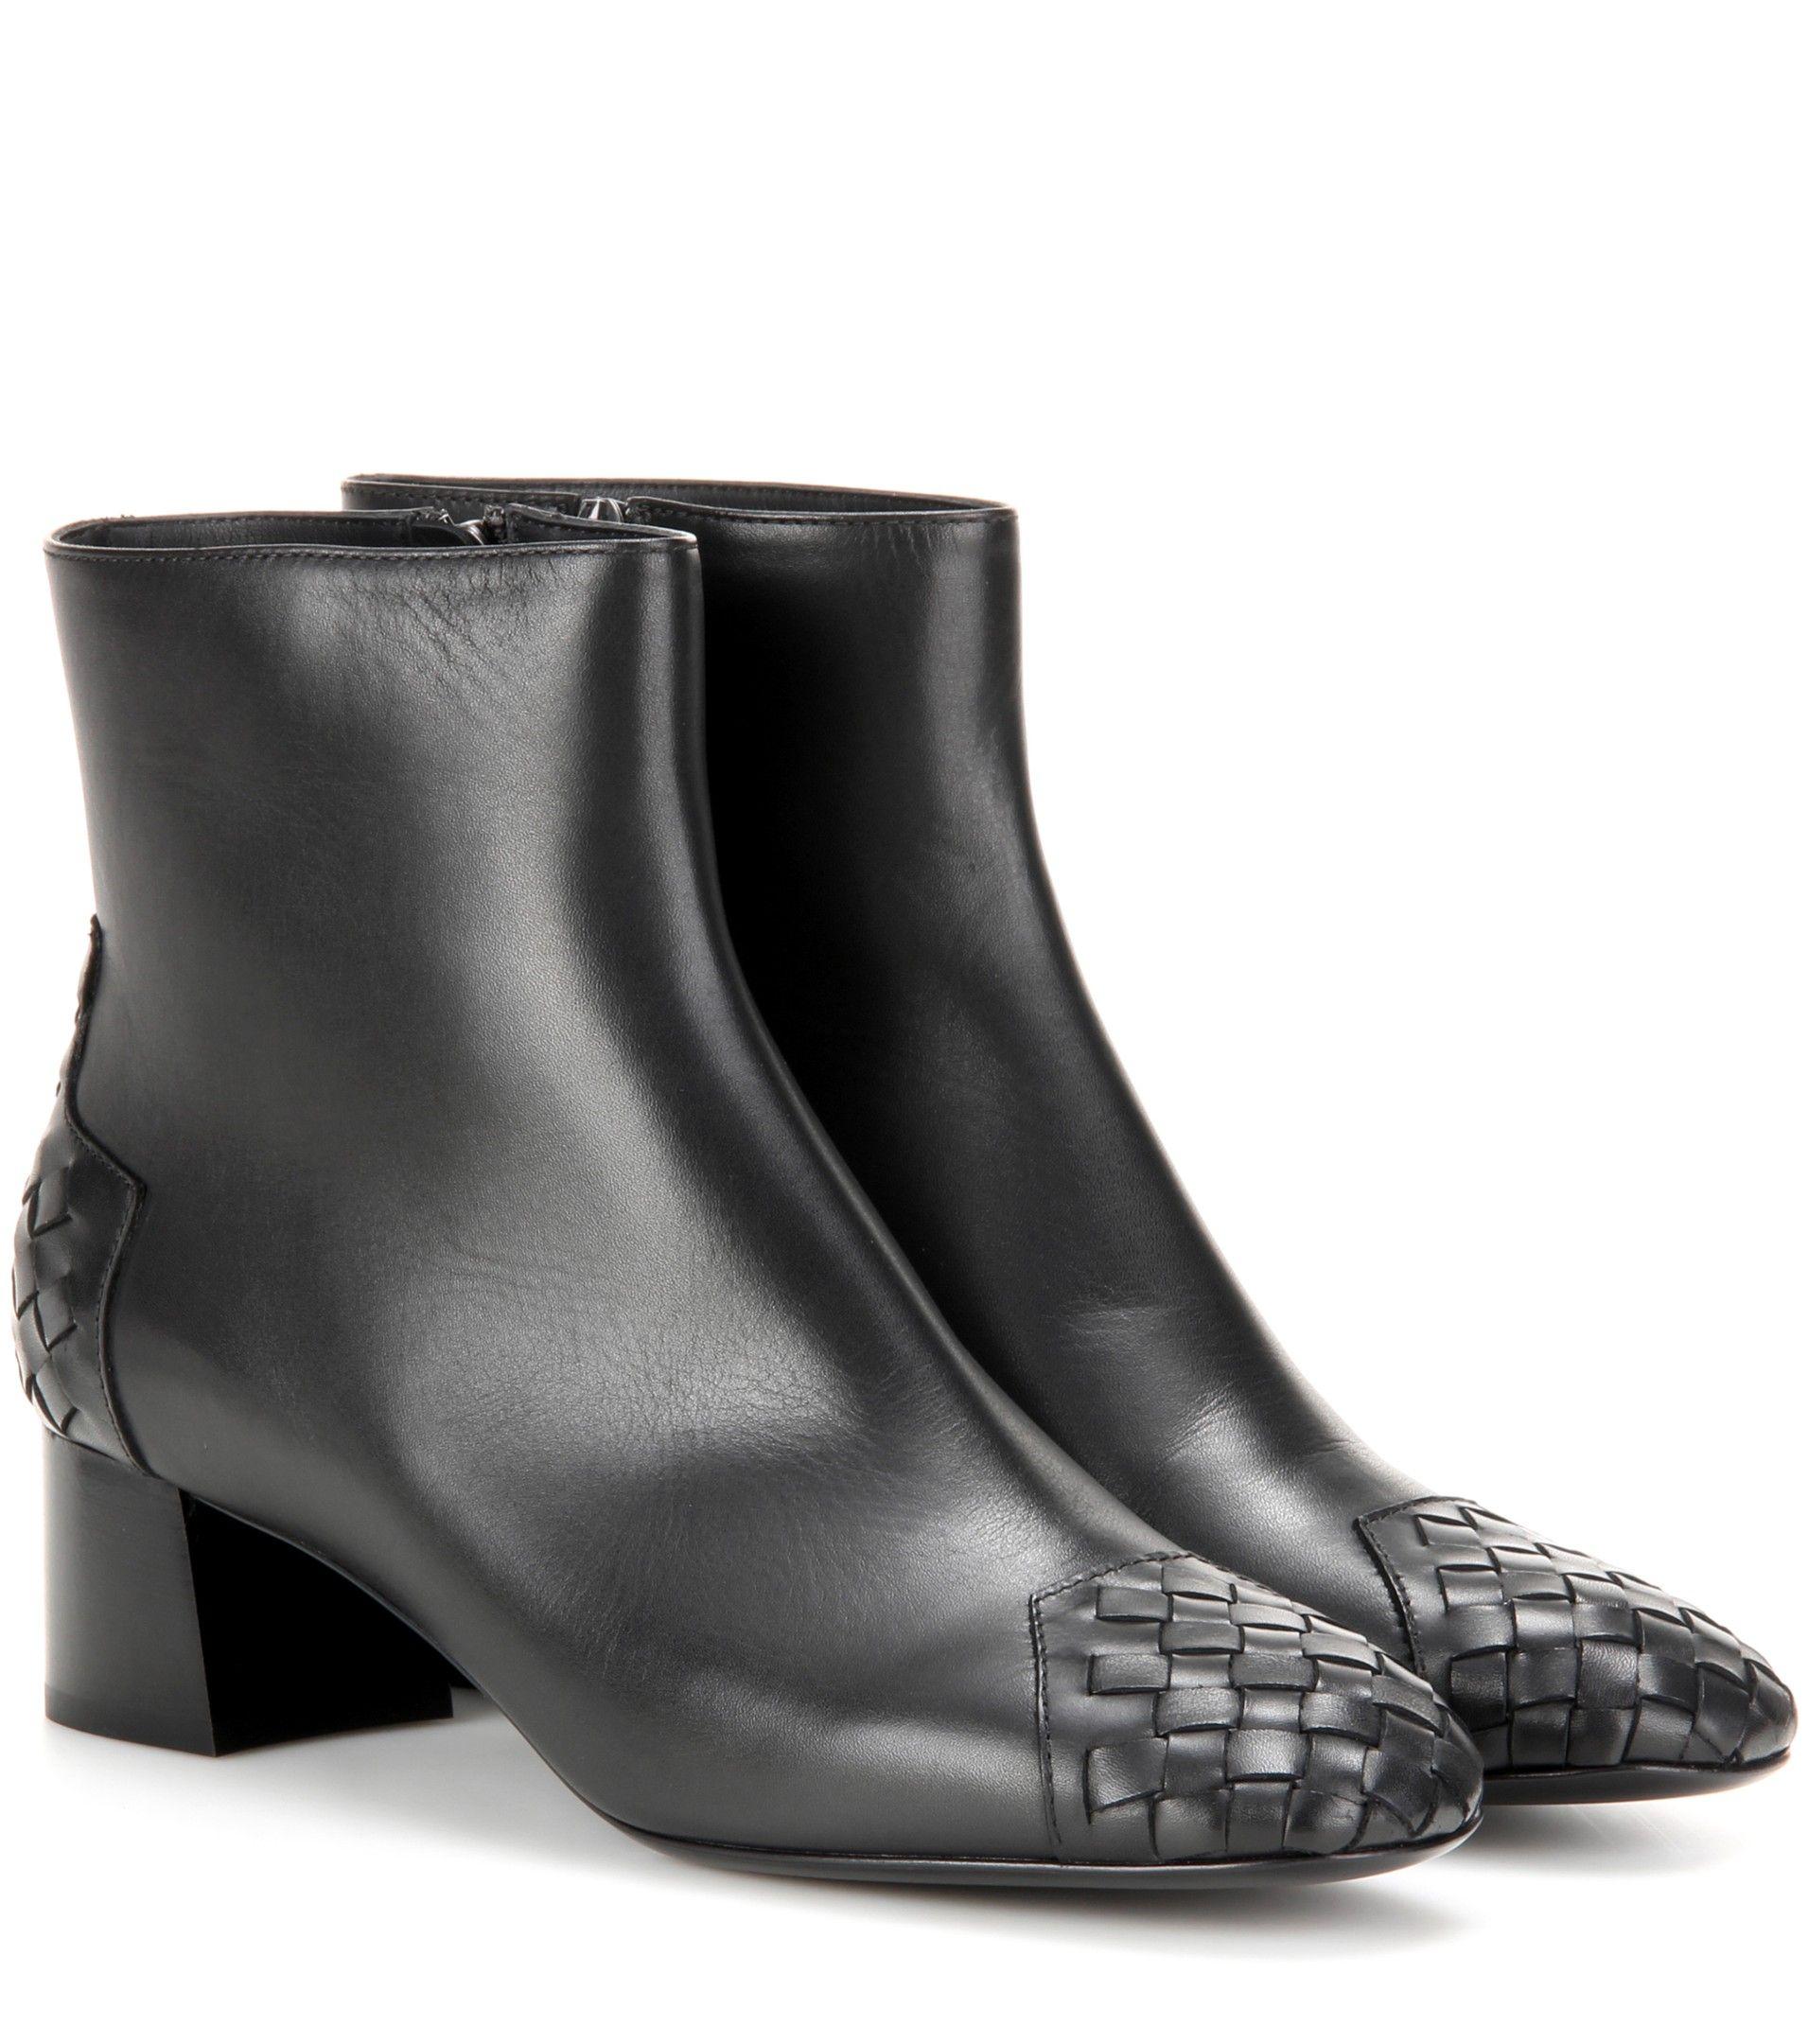 Bottega Veneta Leather 45 ankle boots Black              $129.00